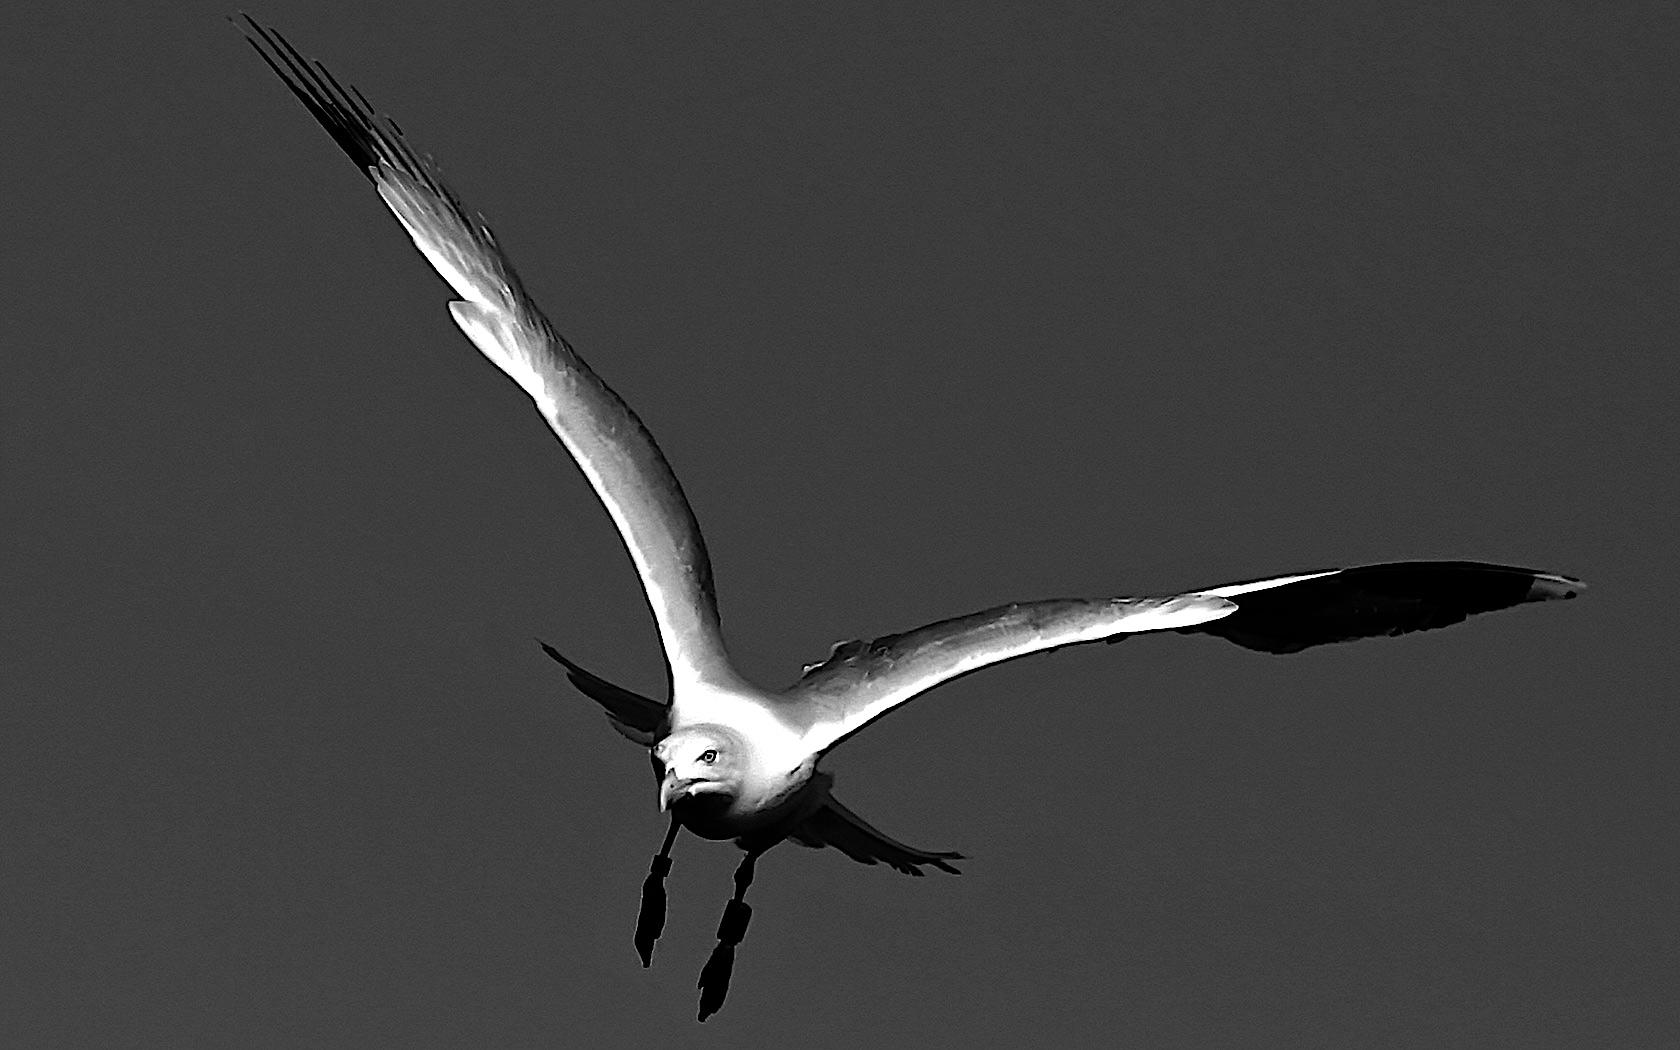 seagull in flight.jpg